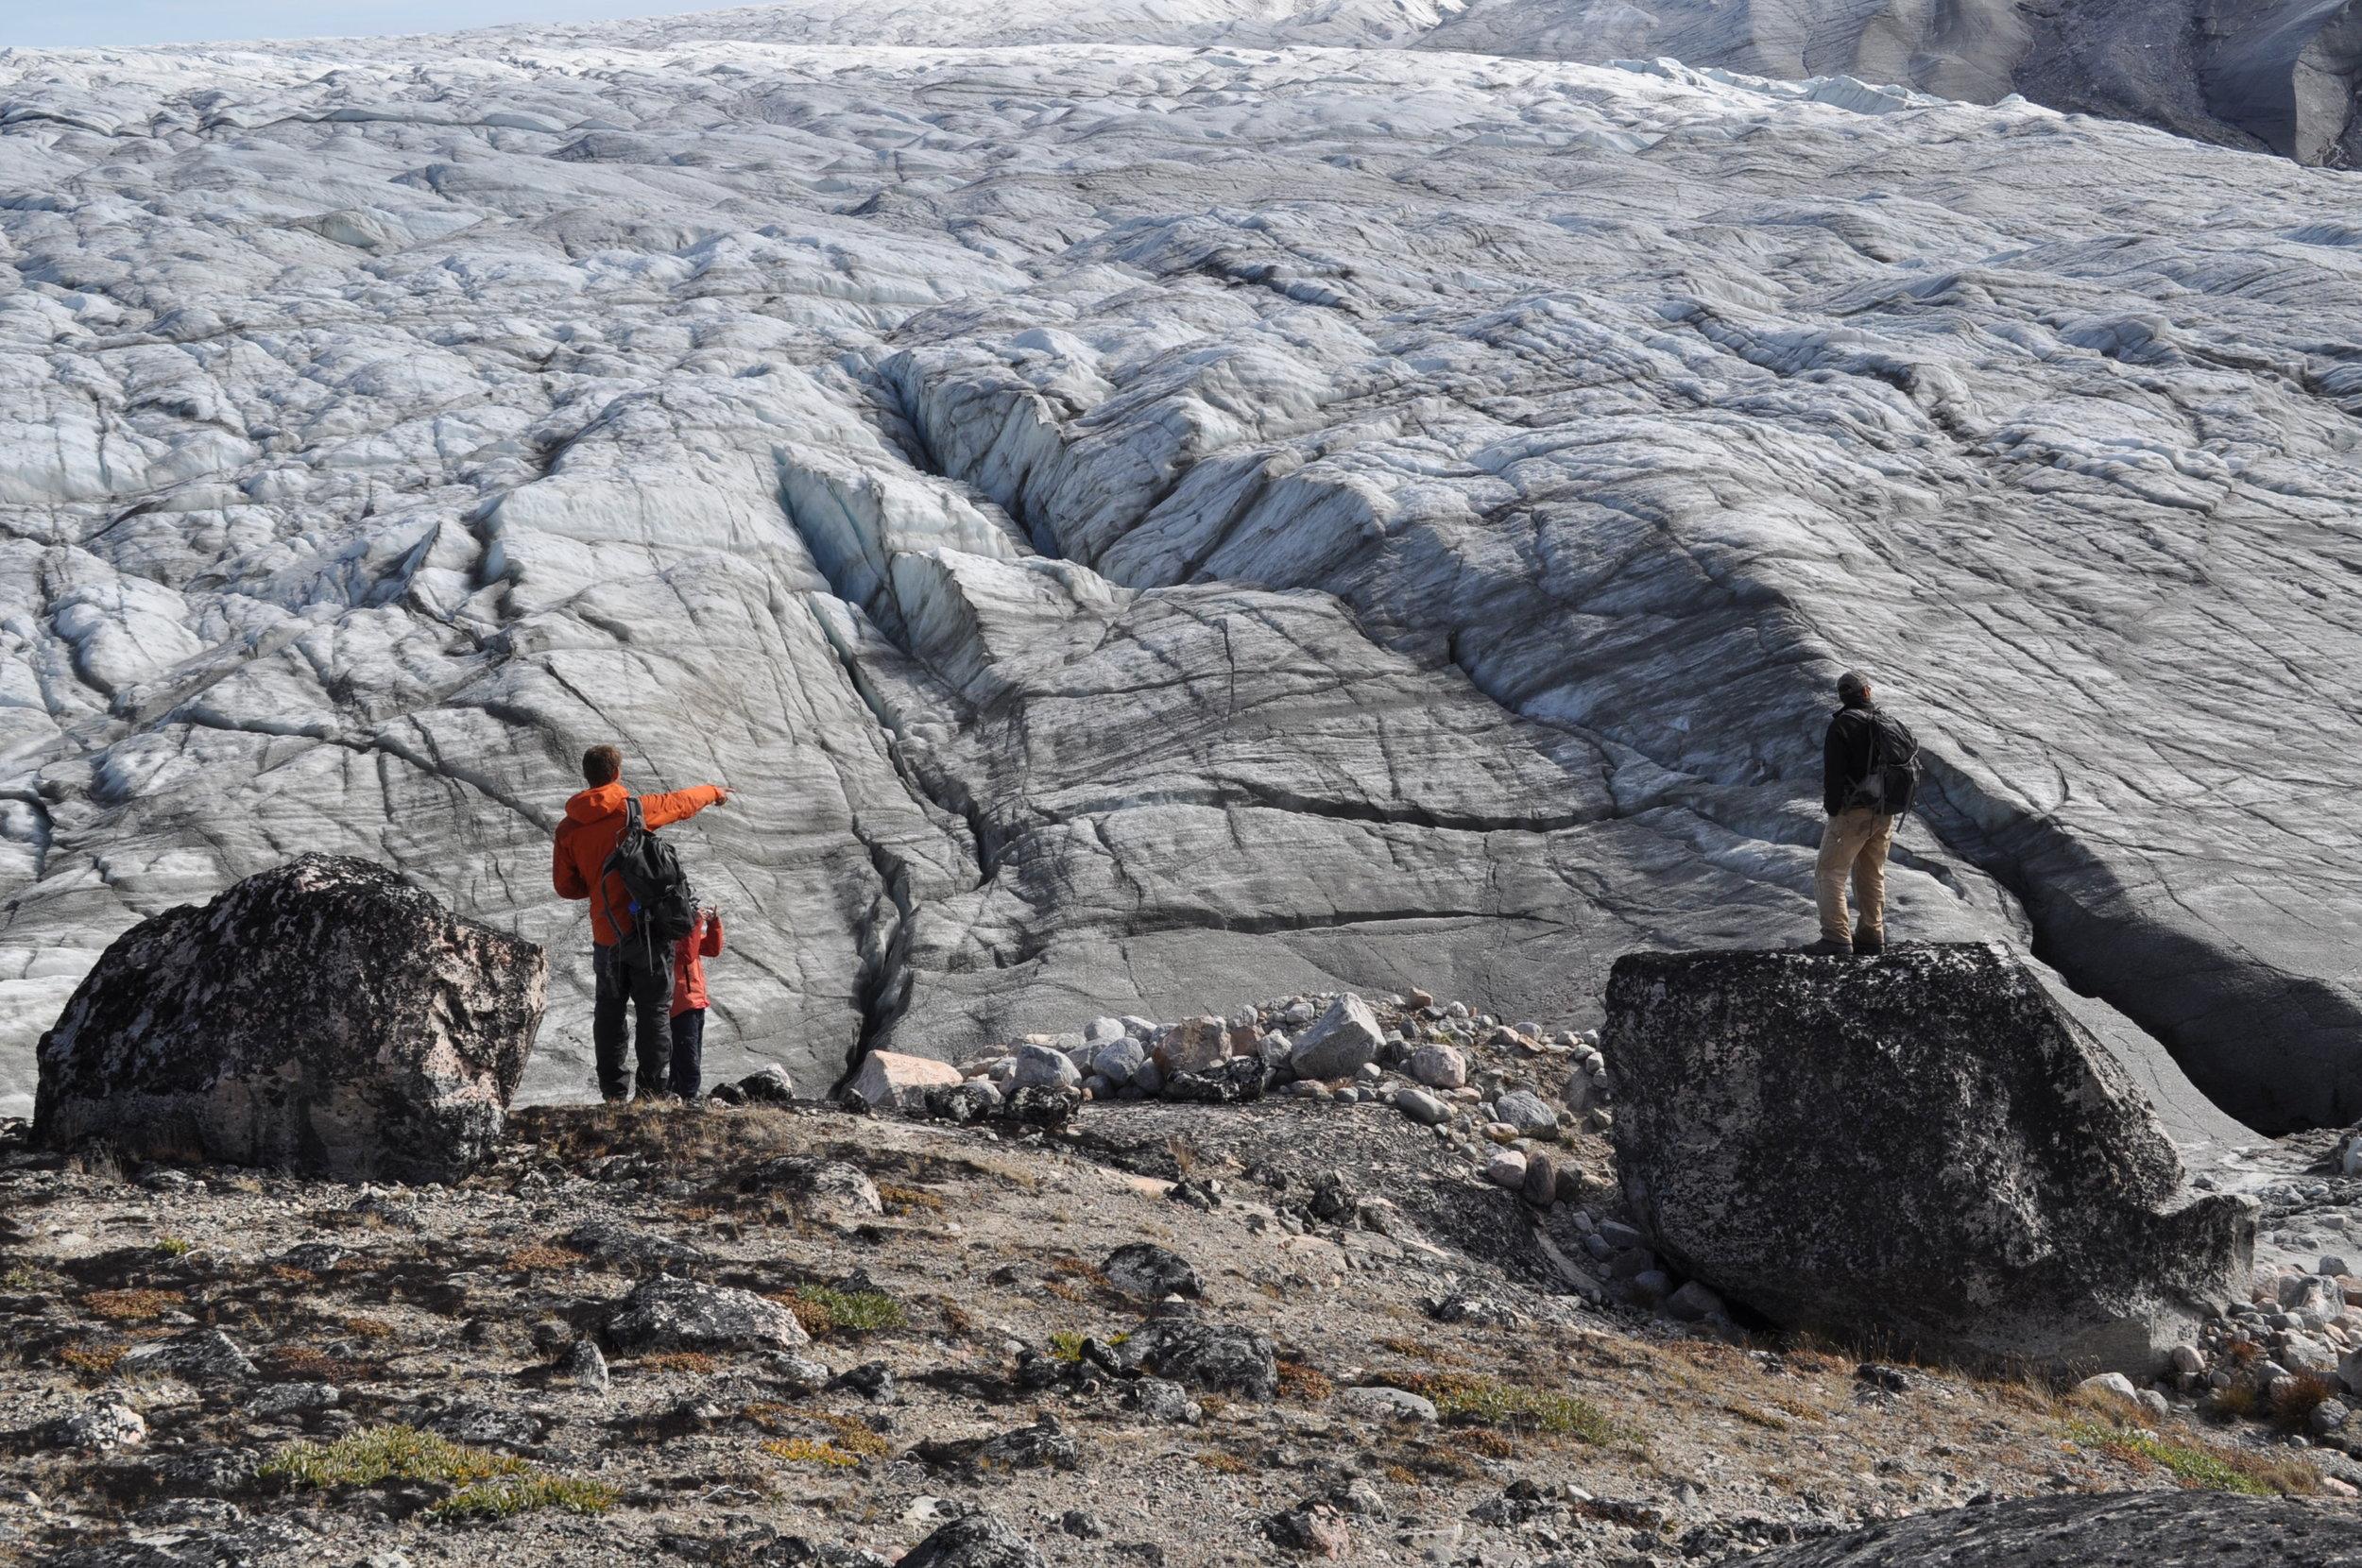 Nicolas Young (LDEO), Elizabeth Thomas (SUNY Buffalo) and Jason Briner (SUNY Buffalo) talk sampling strategies in front of the Greenland Ice Sheet. Photo: Sam Kelley